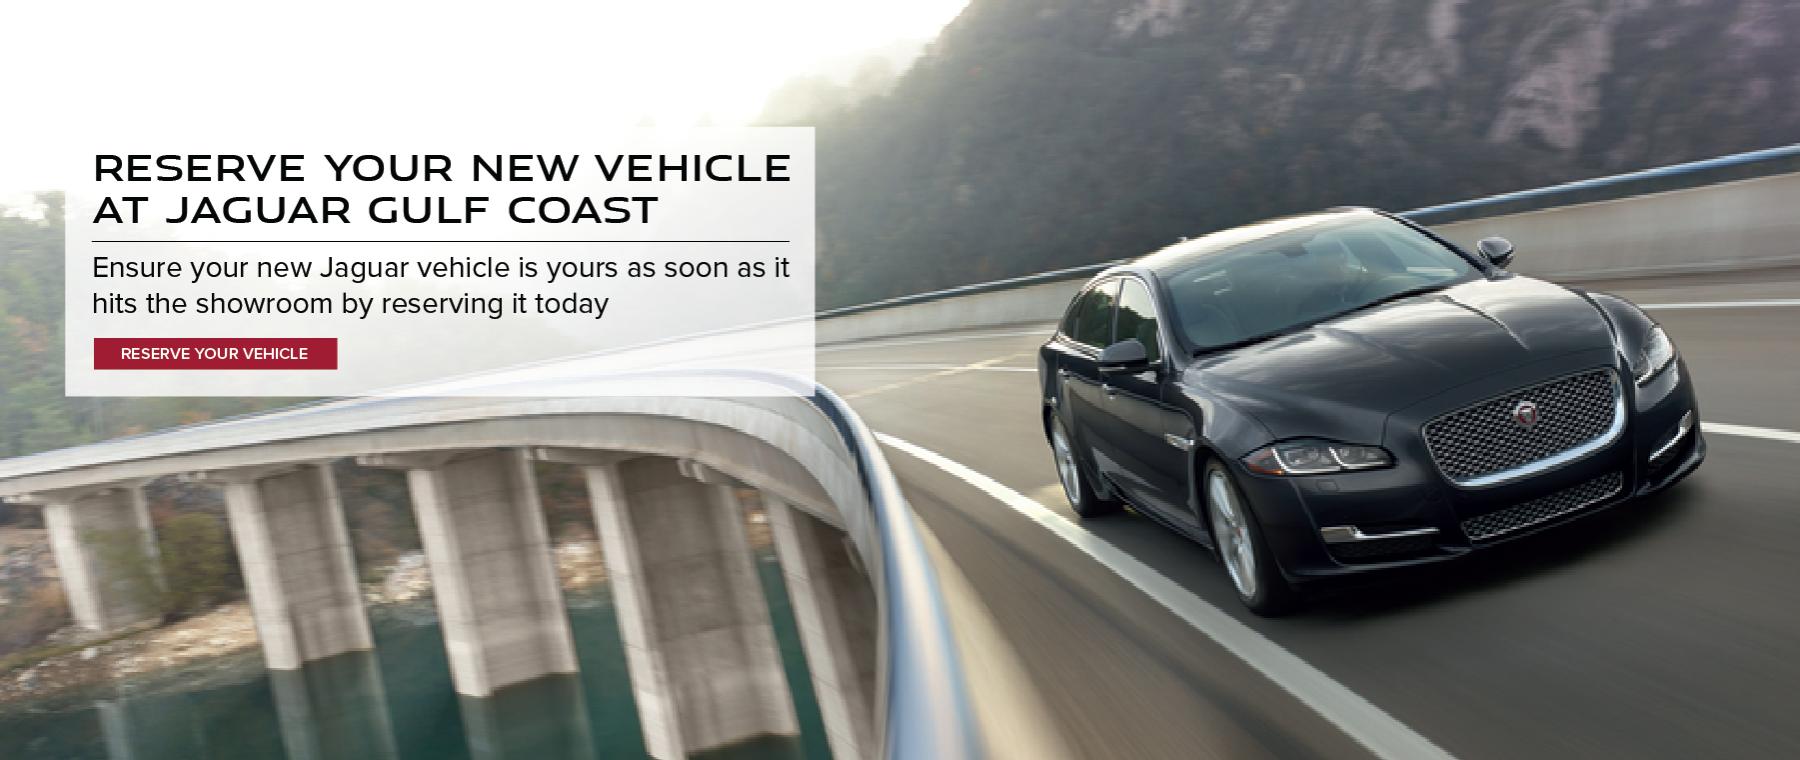 October 2021_Jaguar Reserve Your Vehicle